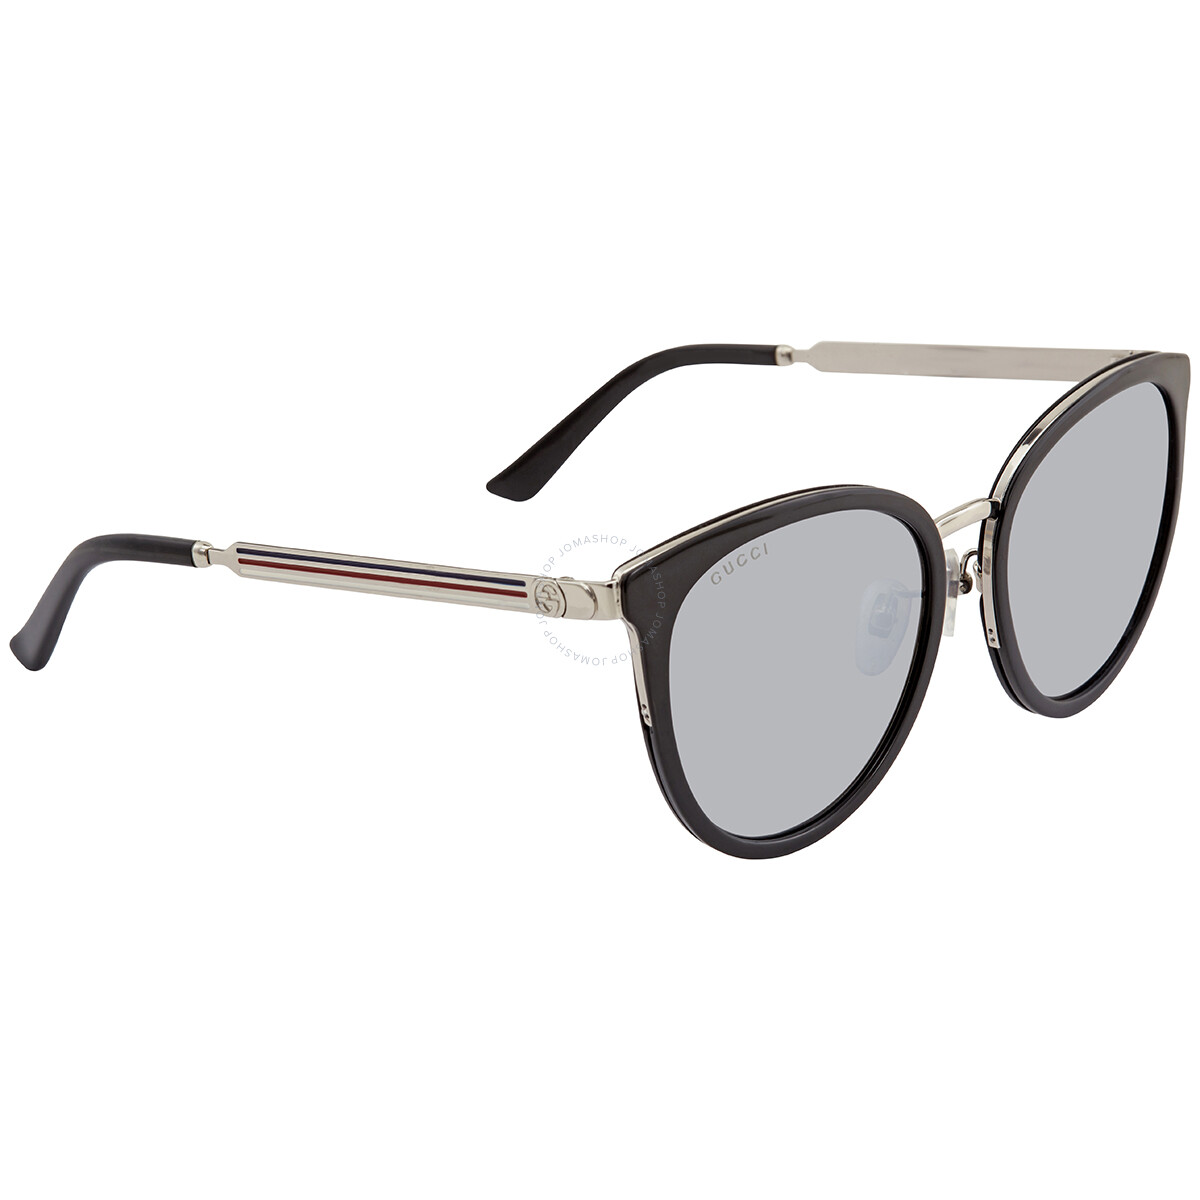 GUCCI Sunglasses UPC & Barcode   upcitemdb.com